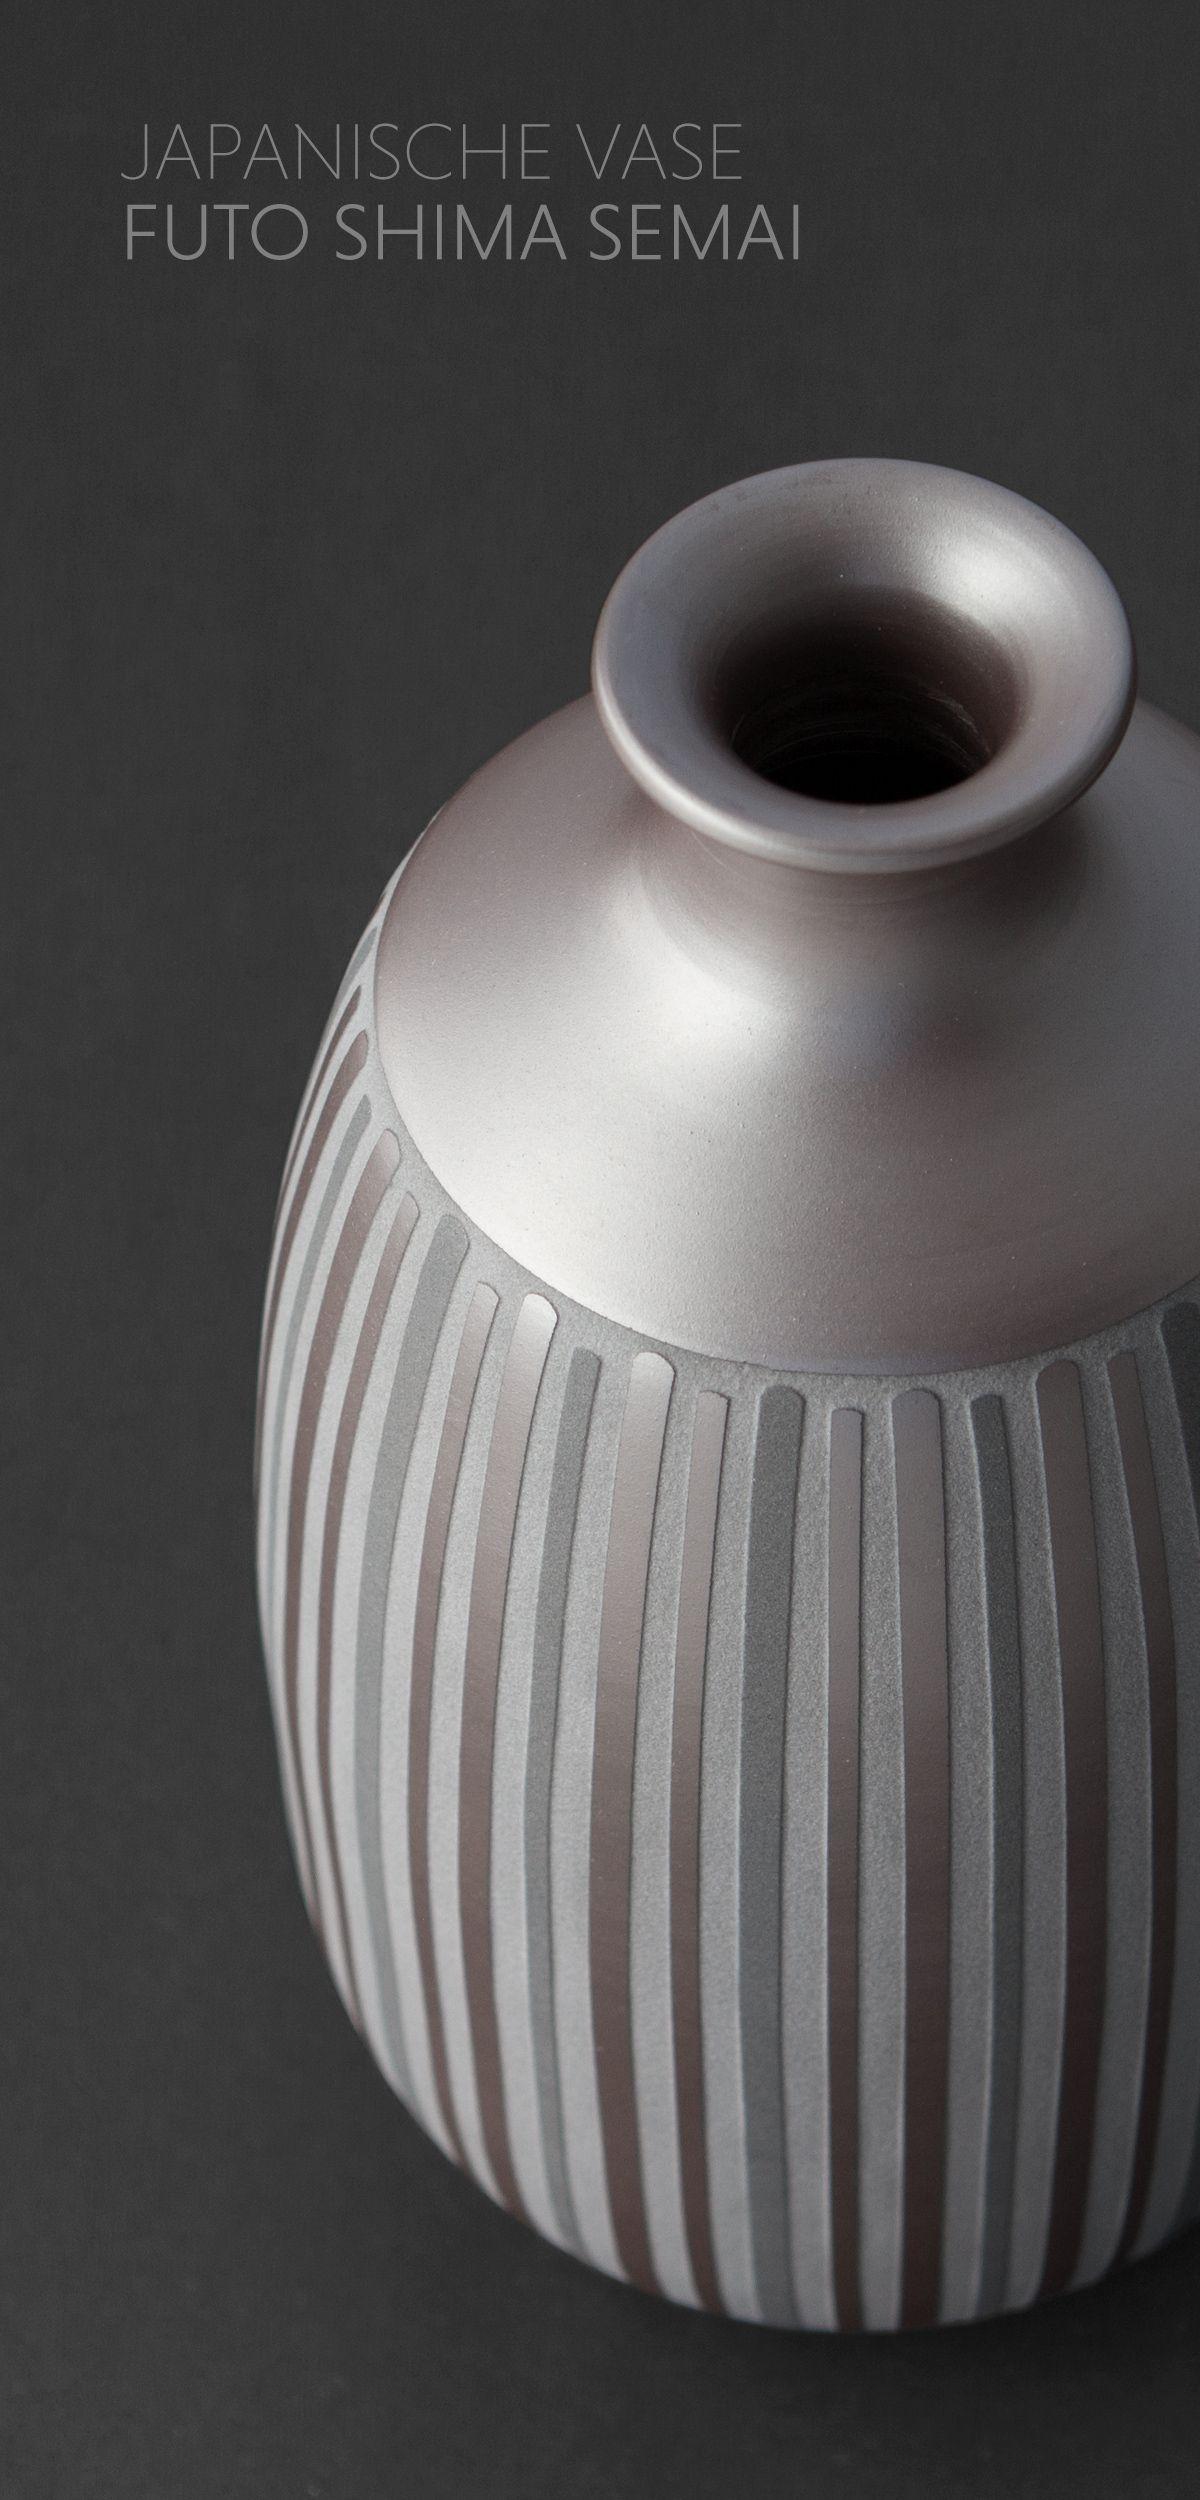 Japanische Vase Futo Shima Semai Mitsukoshi Japan Handgefertigt Osterdeko